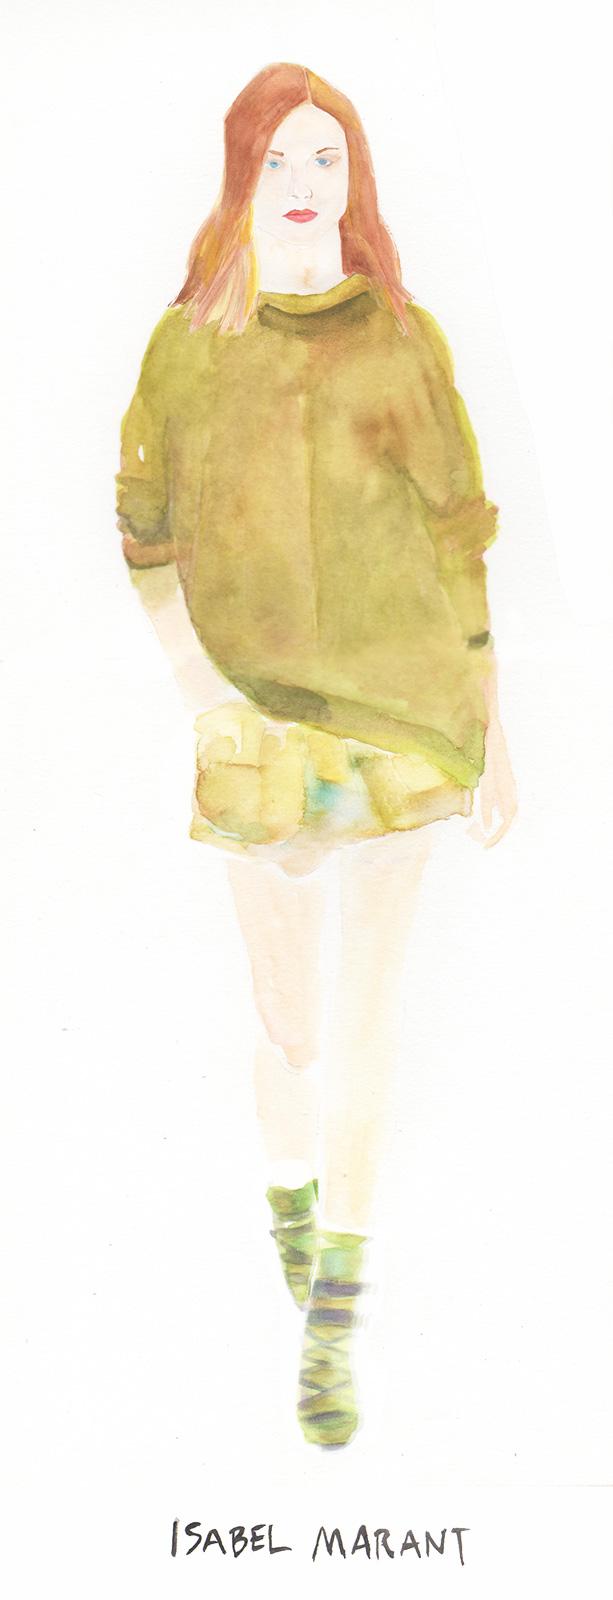 Isabel-Marant-2014-by-Naomi-Yamada.jpg